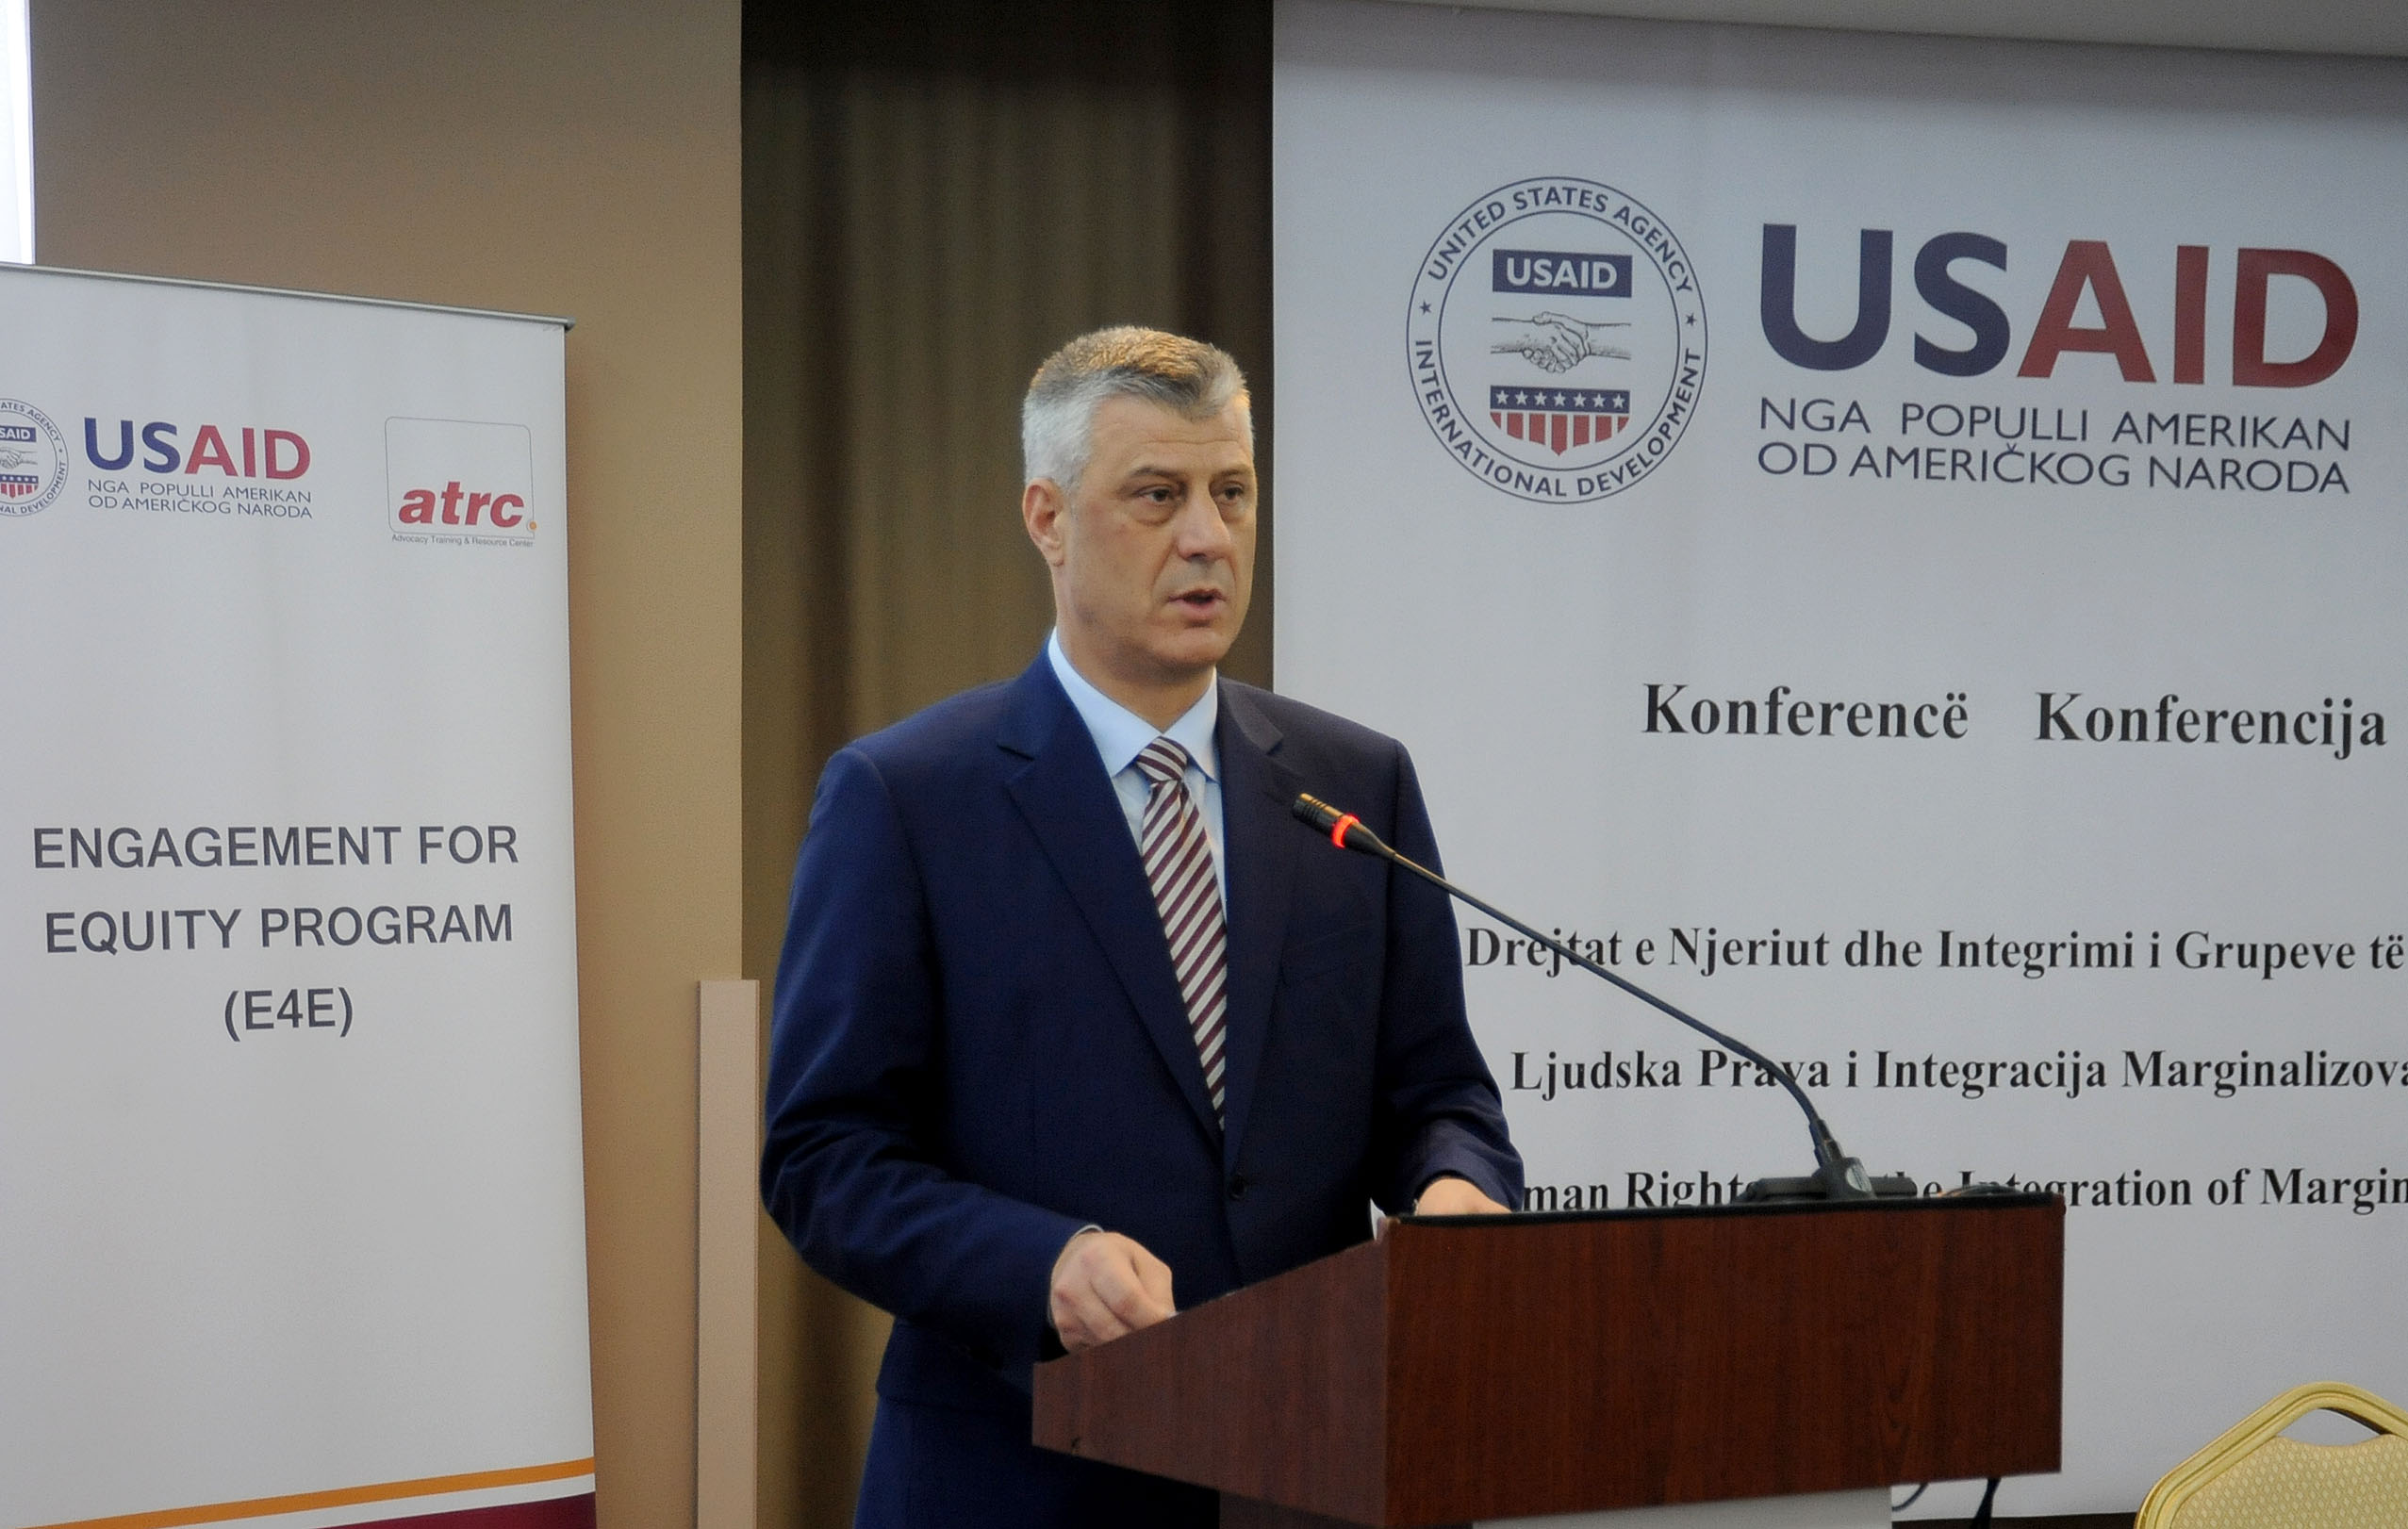 Predsednik: Kosovska država je izgrađena na vrednostima ljudskih prava